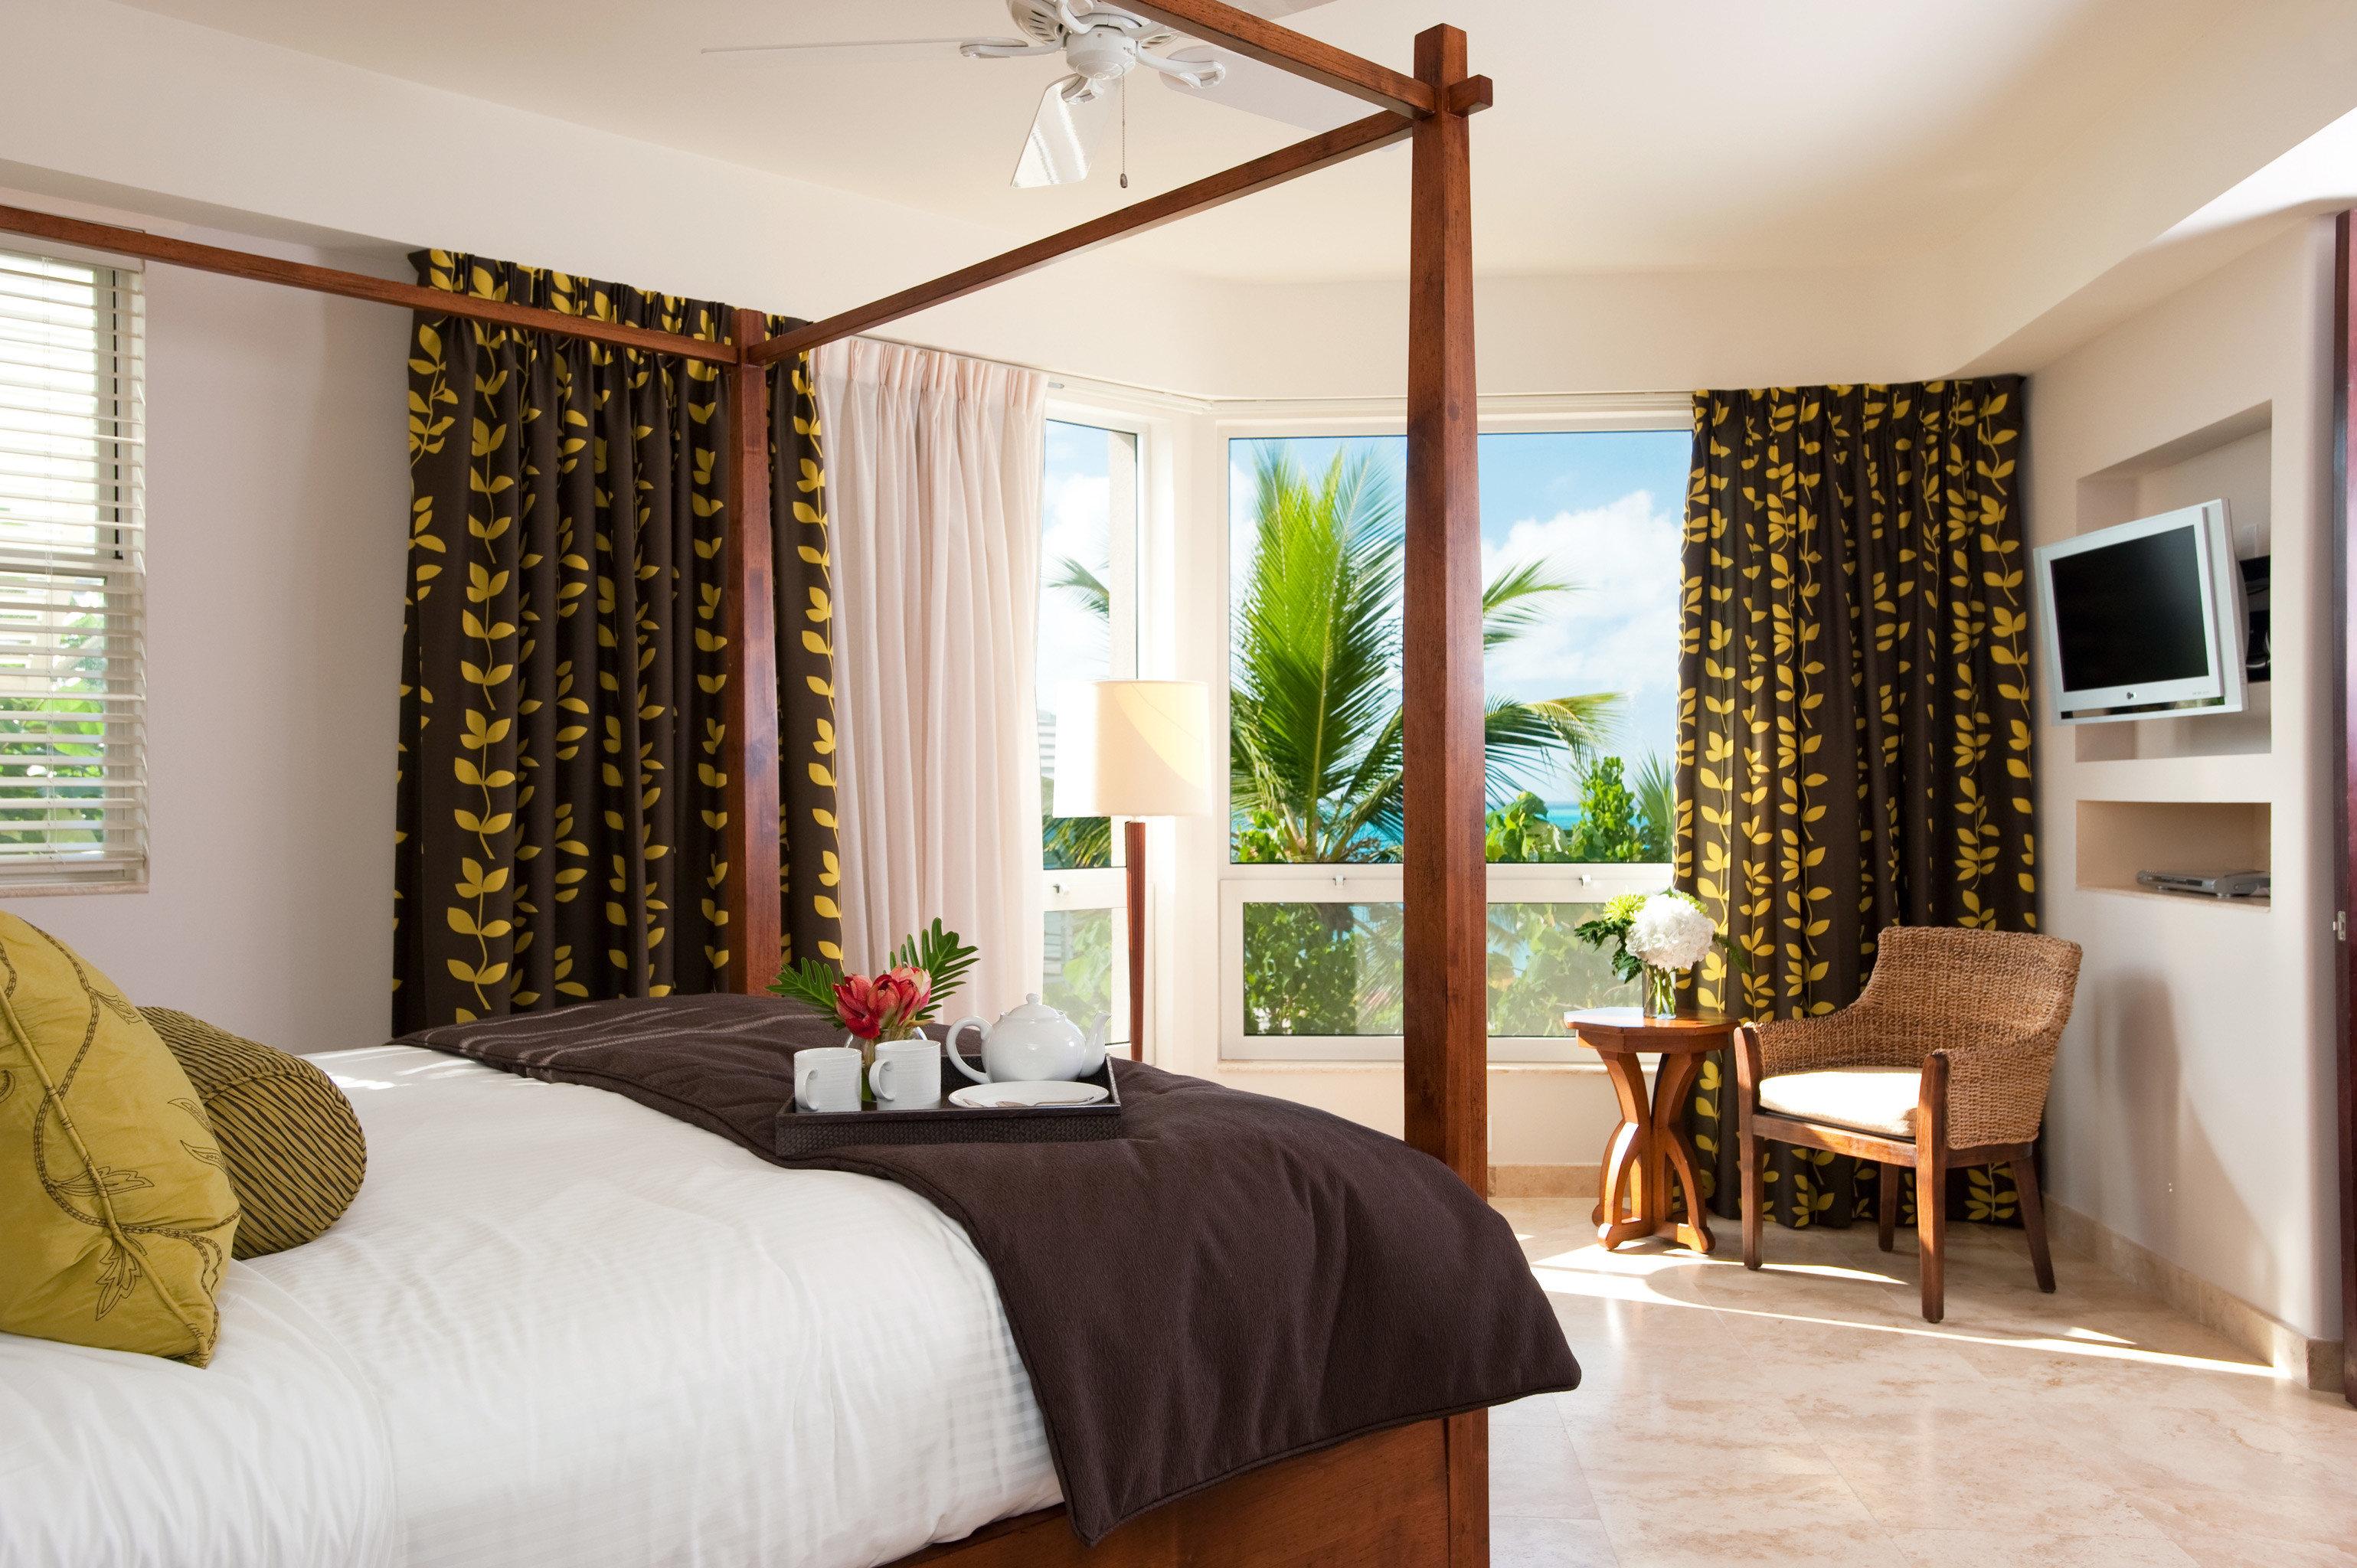 Beachfront Bedroom Luxury sofa property home living room cottage hardwood farmhouse condominium Suite Villa